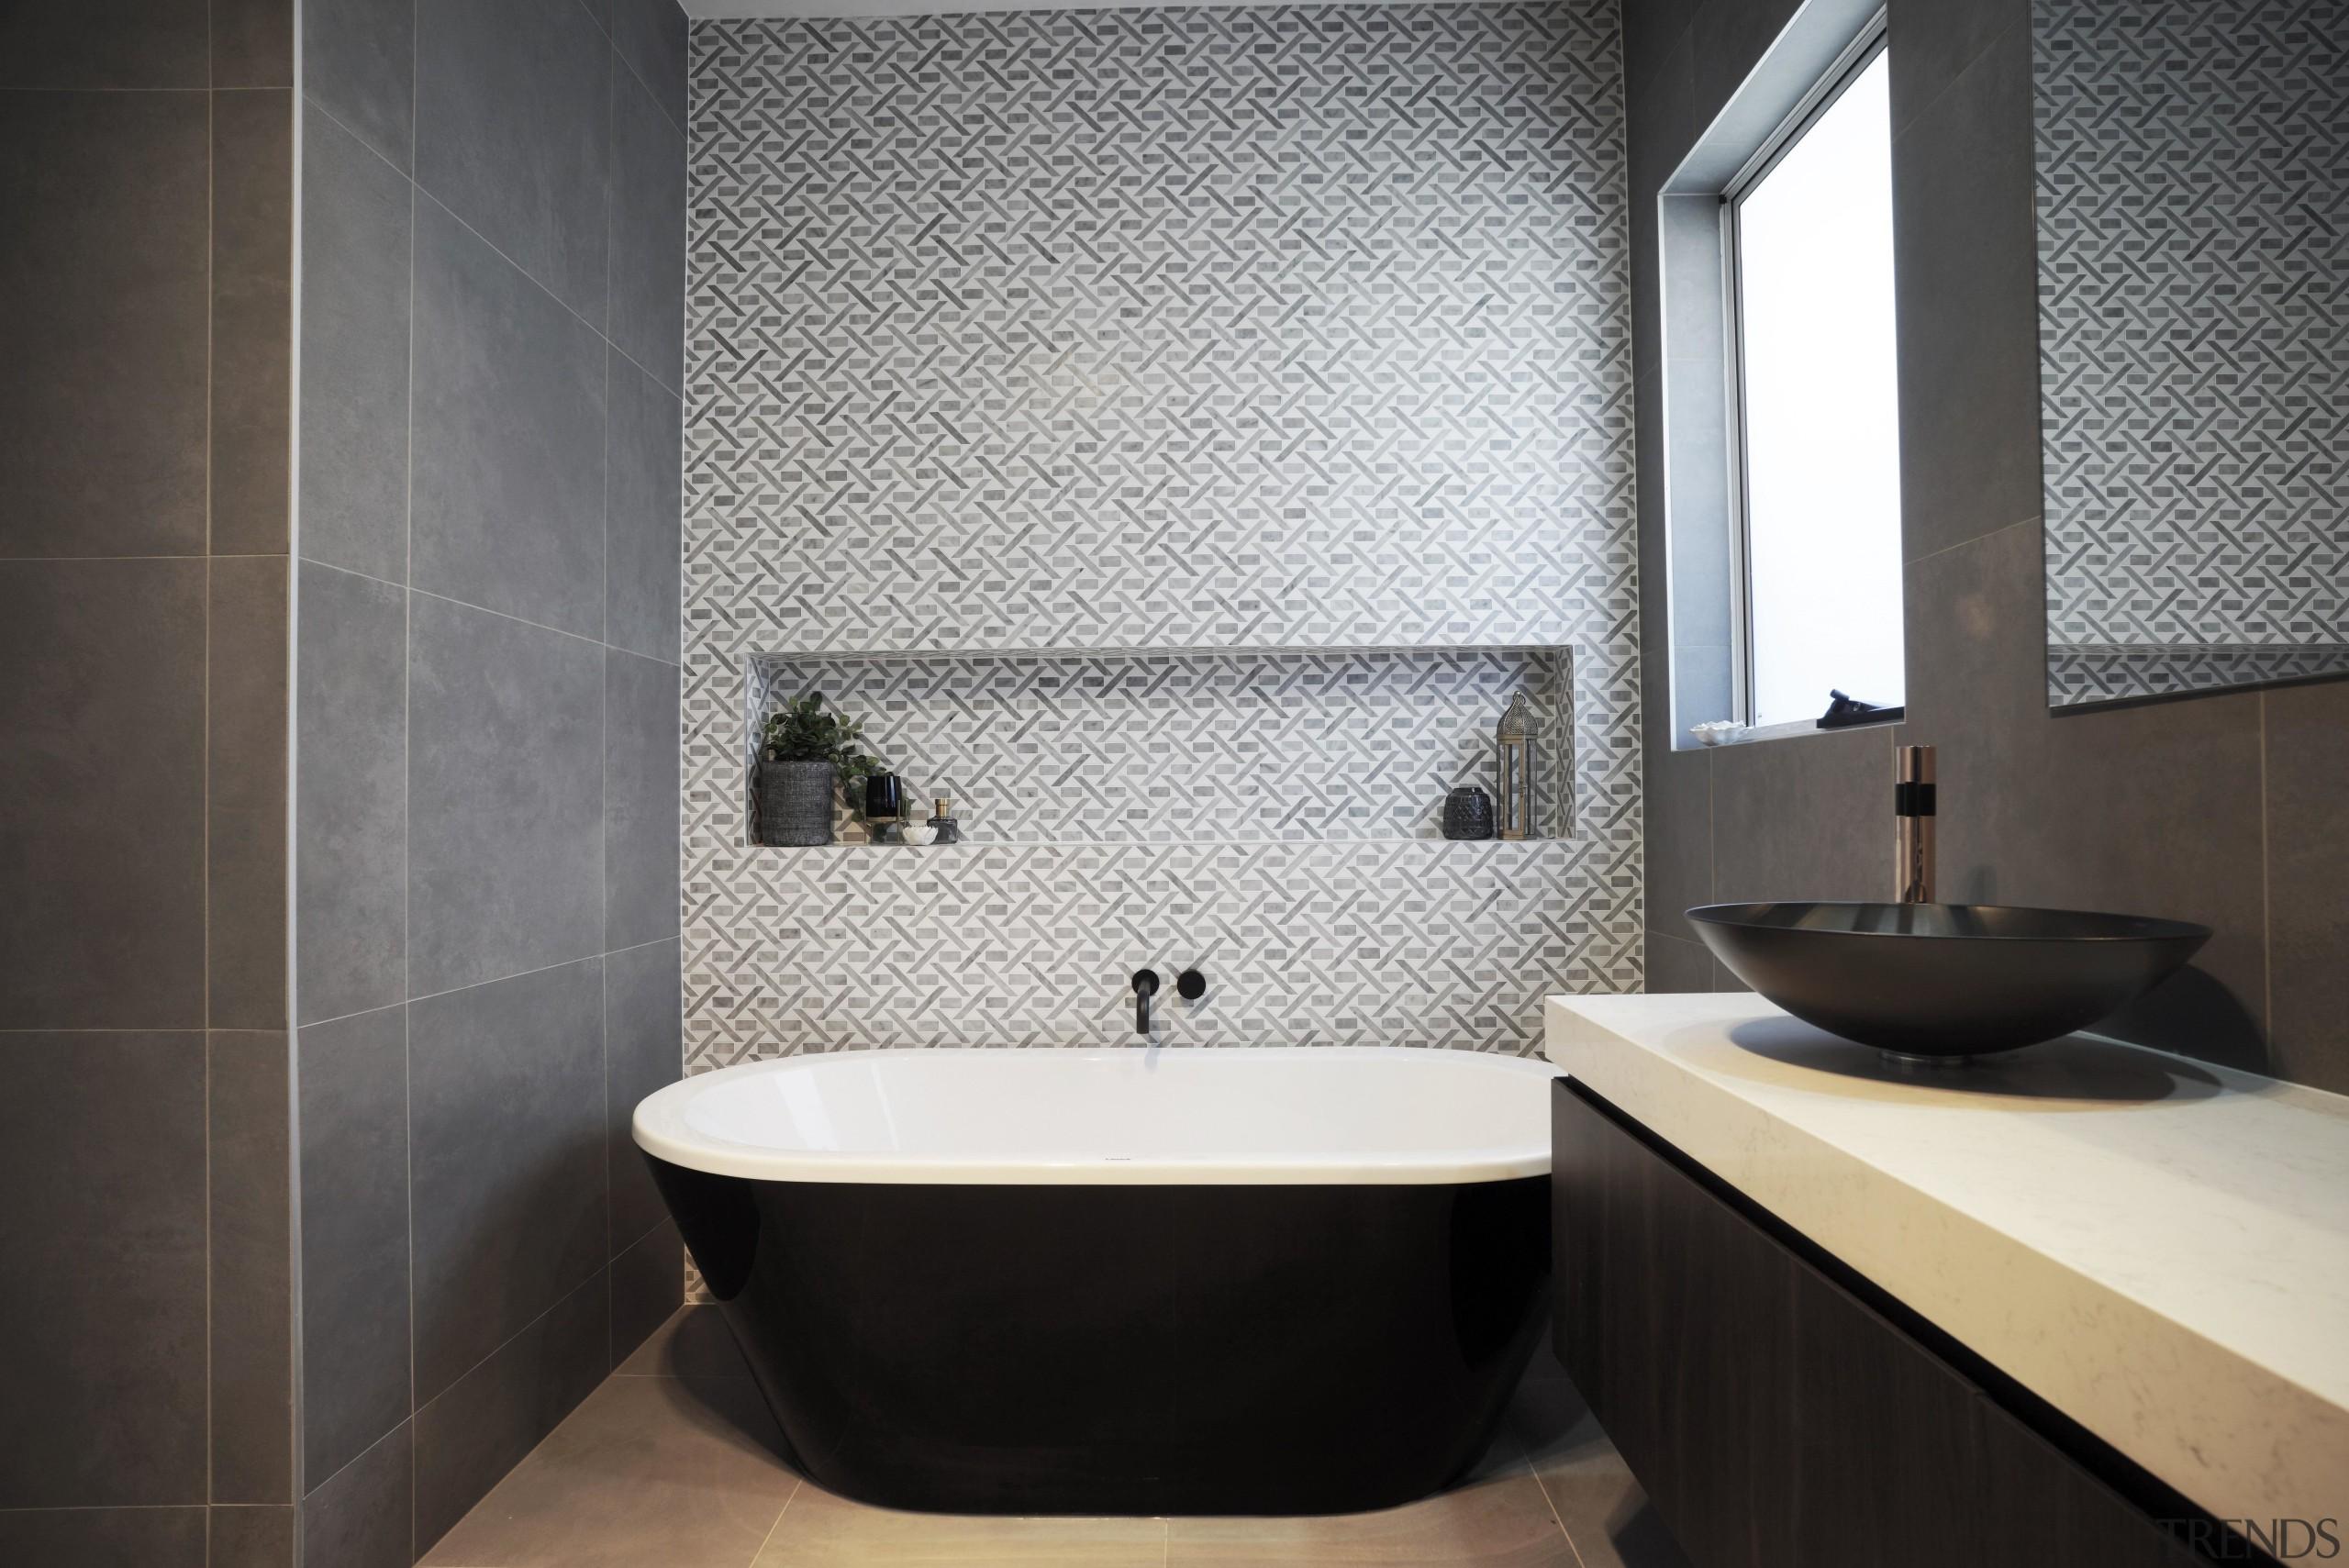 Your motivation for renovating will impact the decisions architecture, bathroom, bathroom accessory, bathtub, bidet, ceramic, floor, flooring, interior design, plumbing fixture, property, room, sink, tap, tile, toilet, wall, black, gray